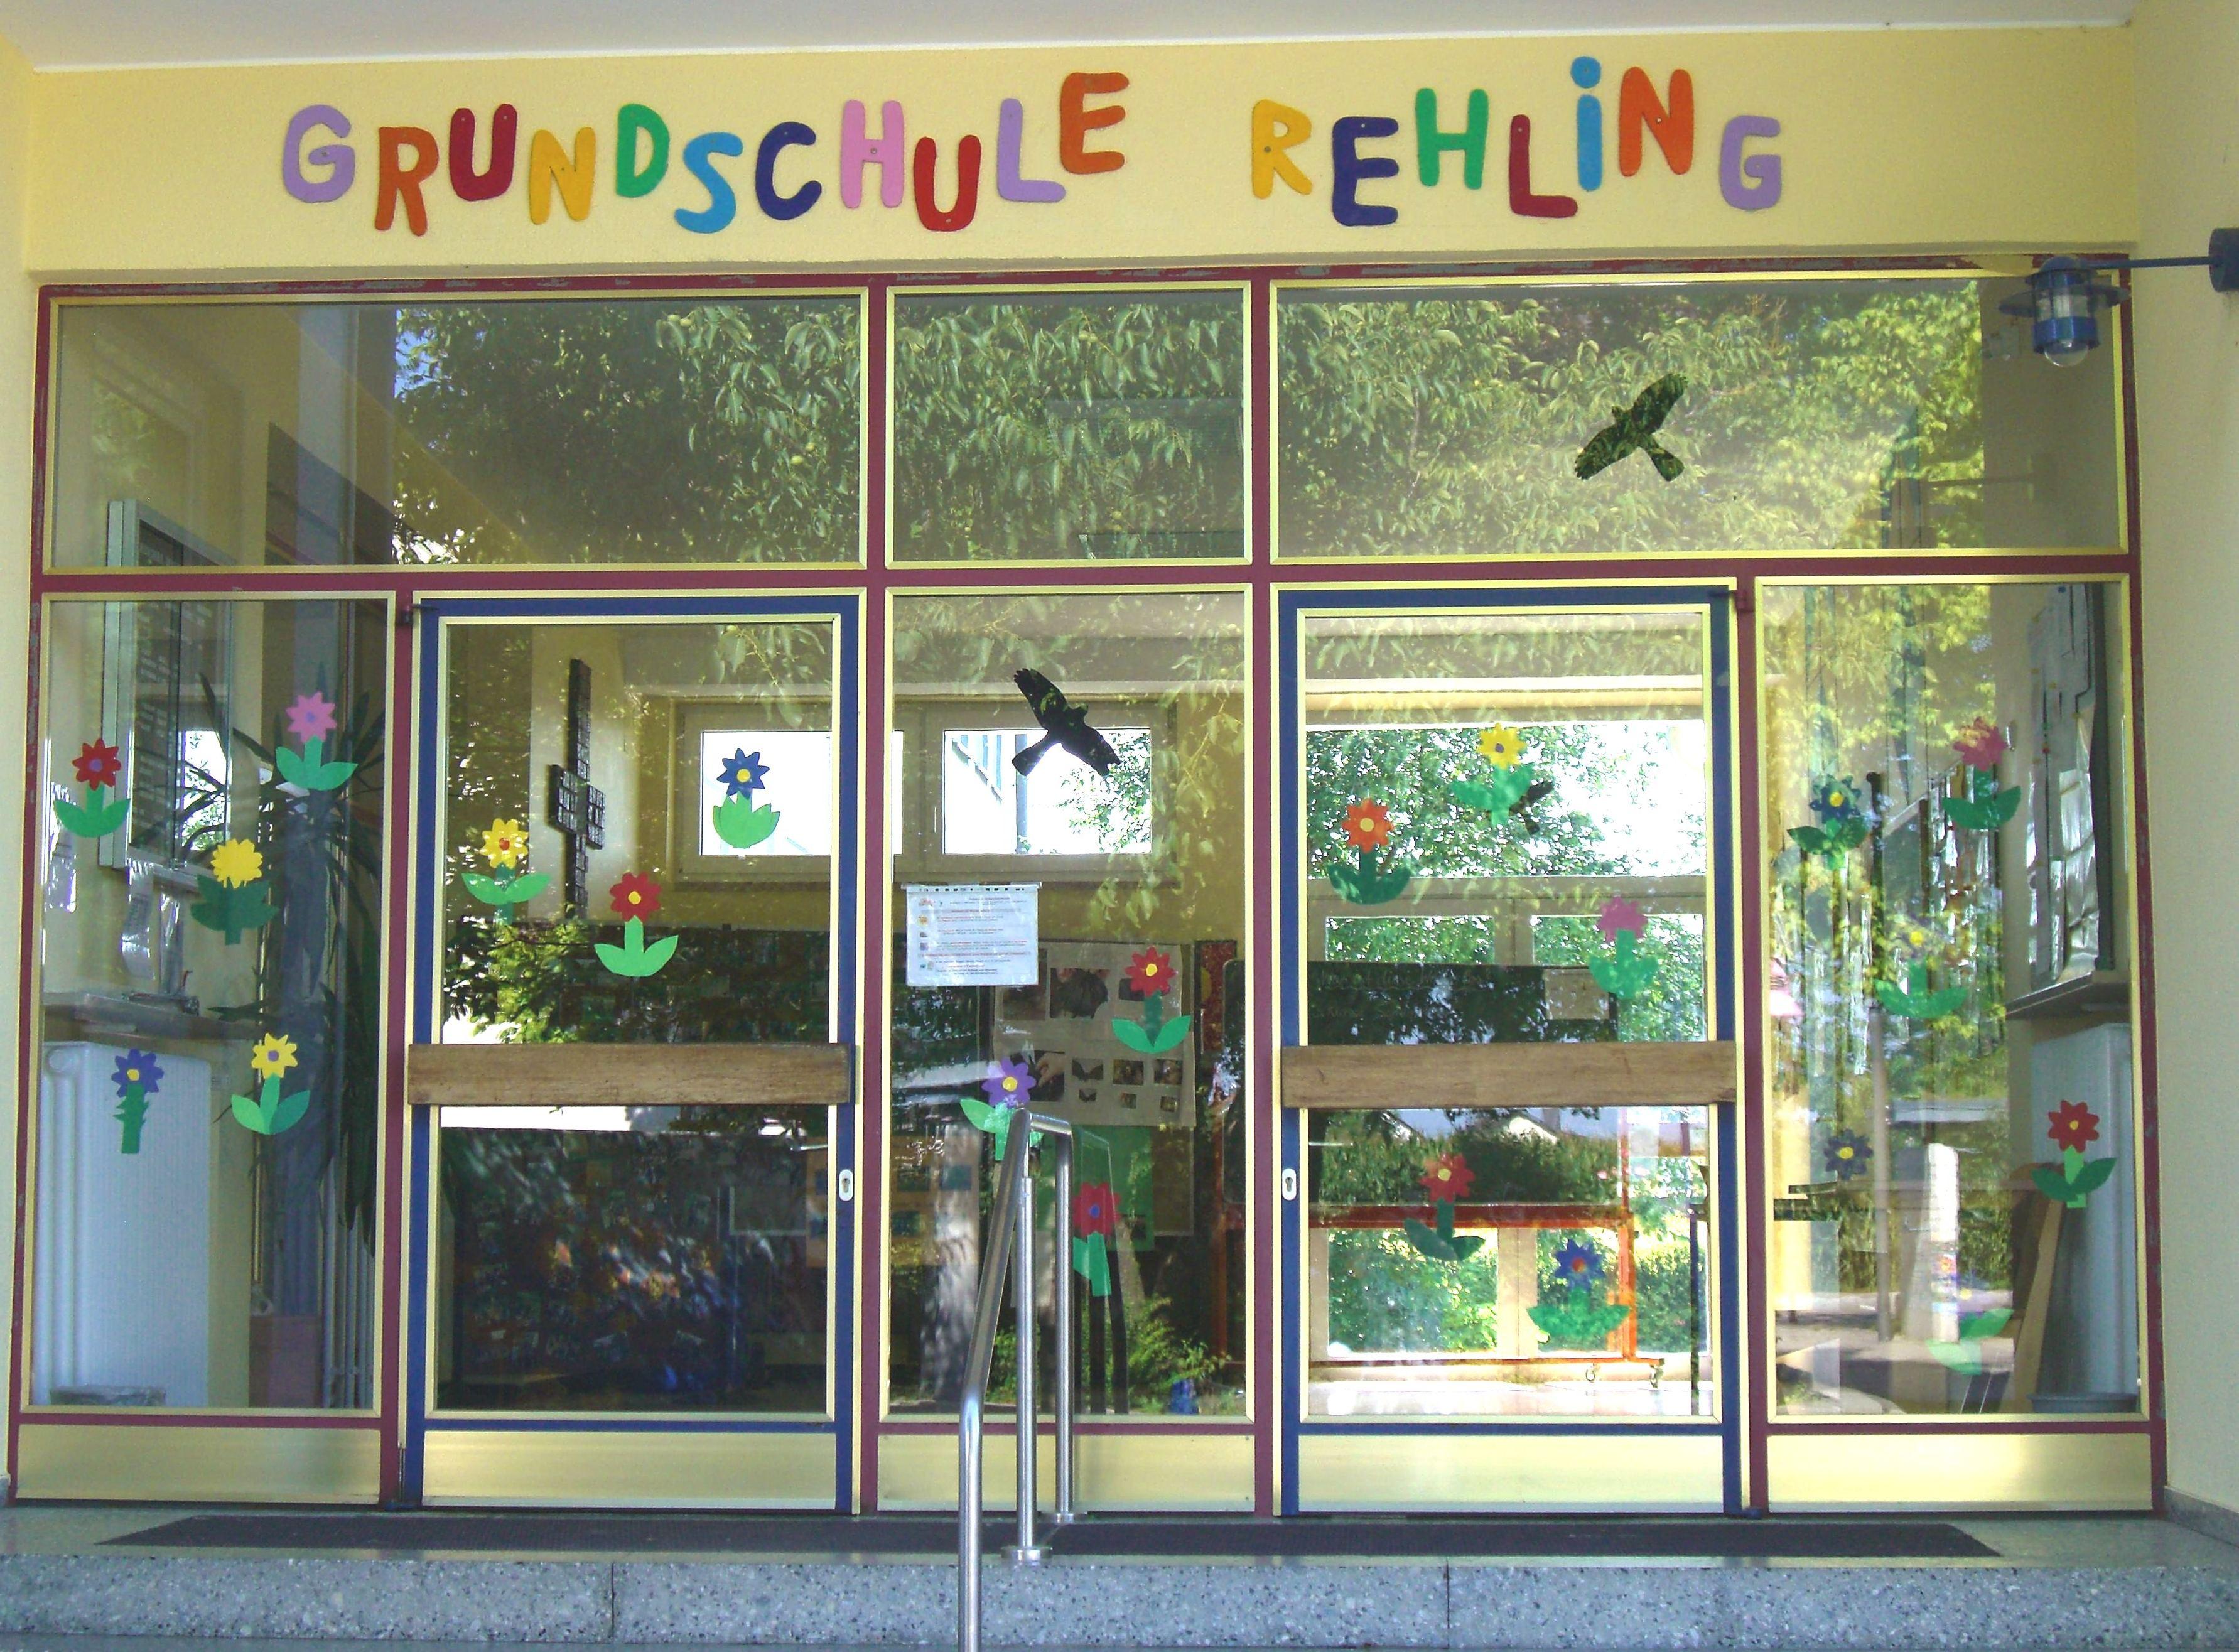 GRUNDSCHULE REHLING